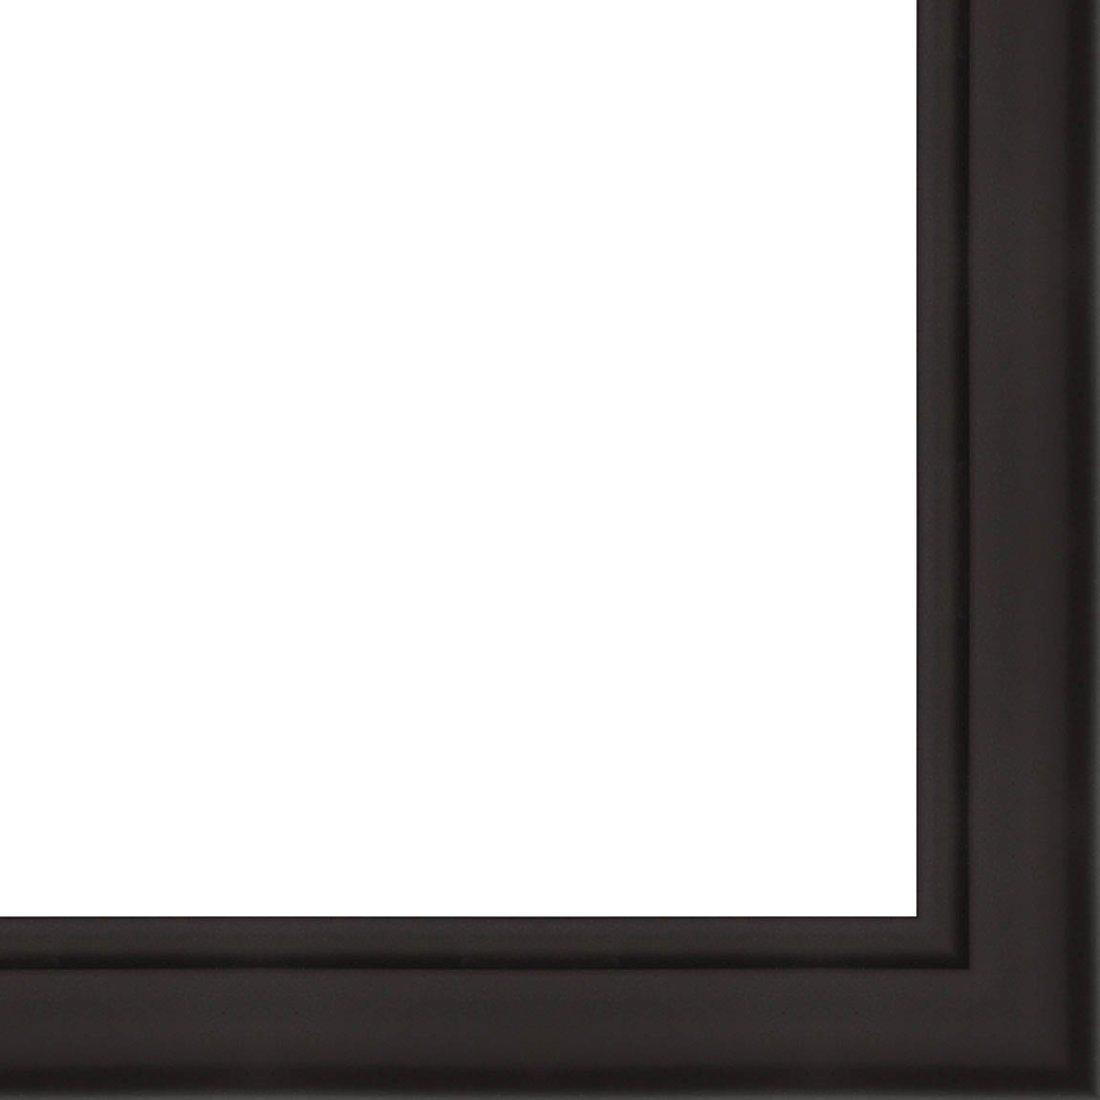 Picture Frame Moulding (Wood) 18ft bundle - Contemporary Black Finish - 1.25'' width - 1/2'' rabbet depth